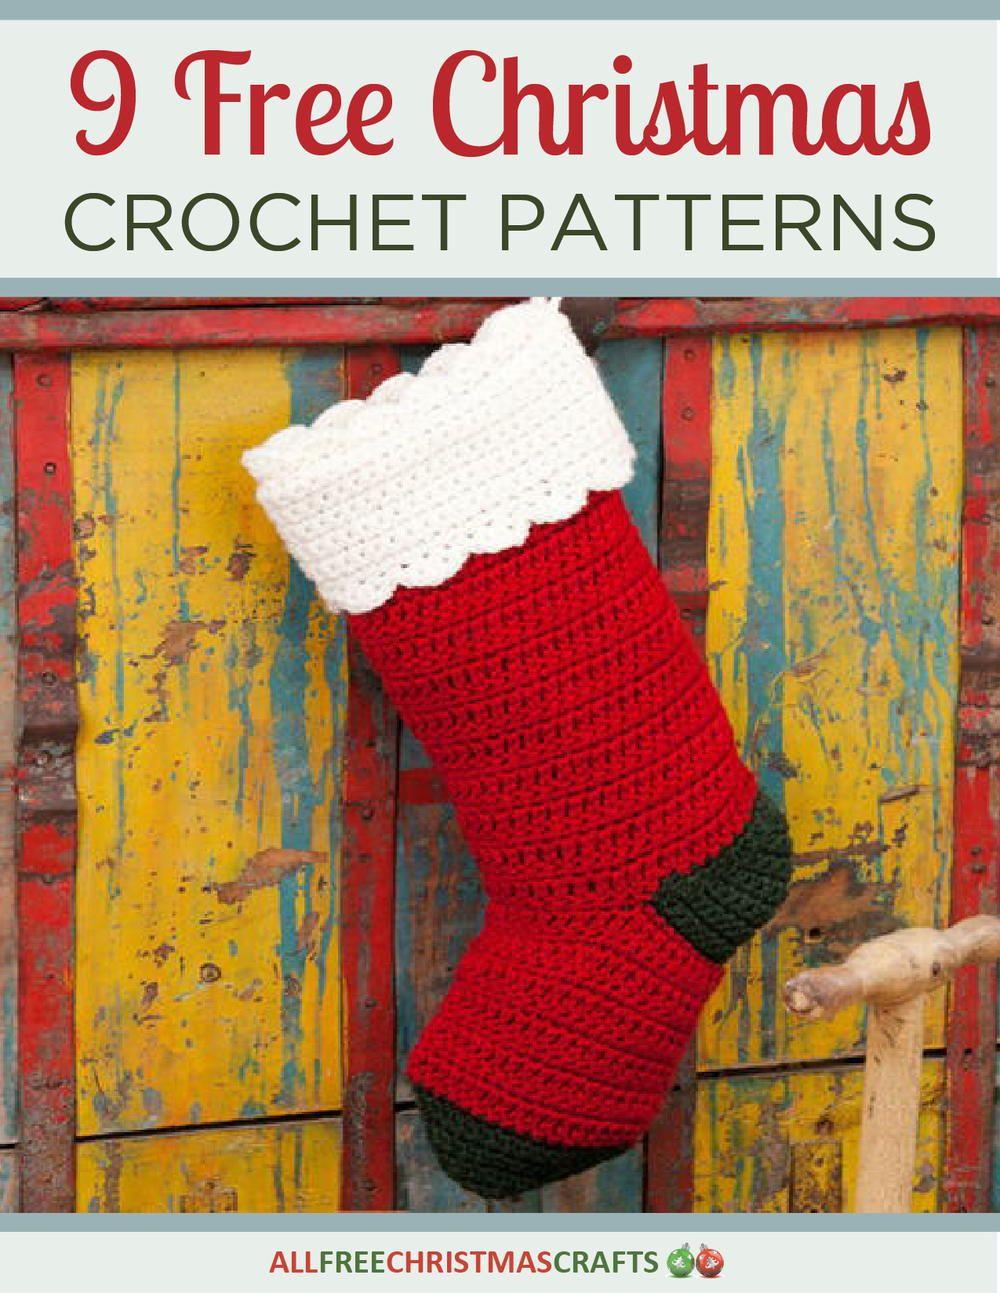 9 Free Christmas Crochet Patterns free eBook   Pinterest   Christmas ...